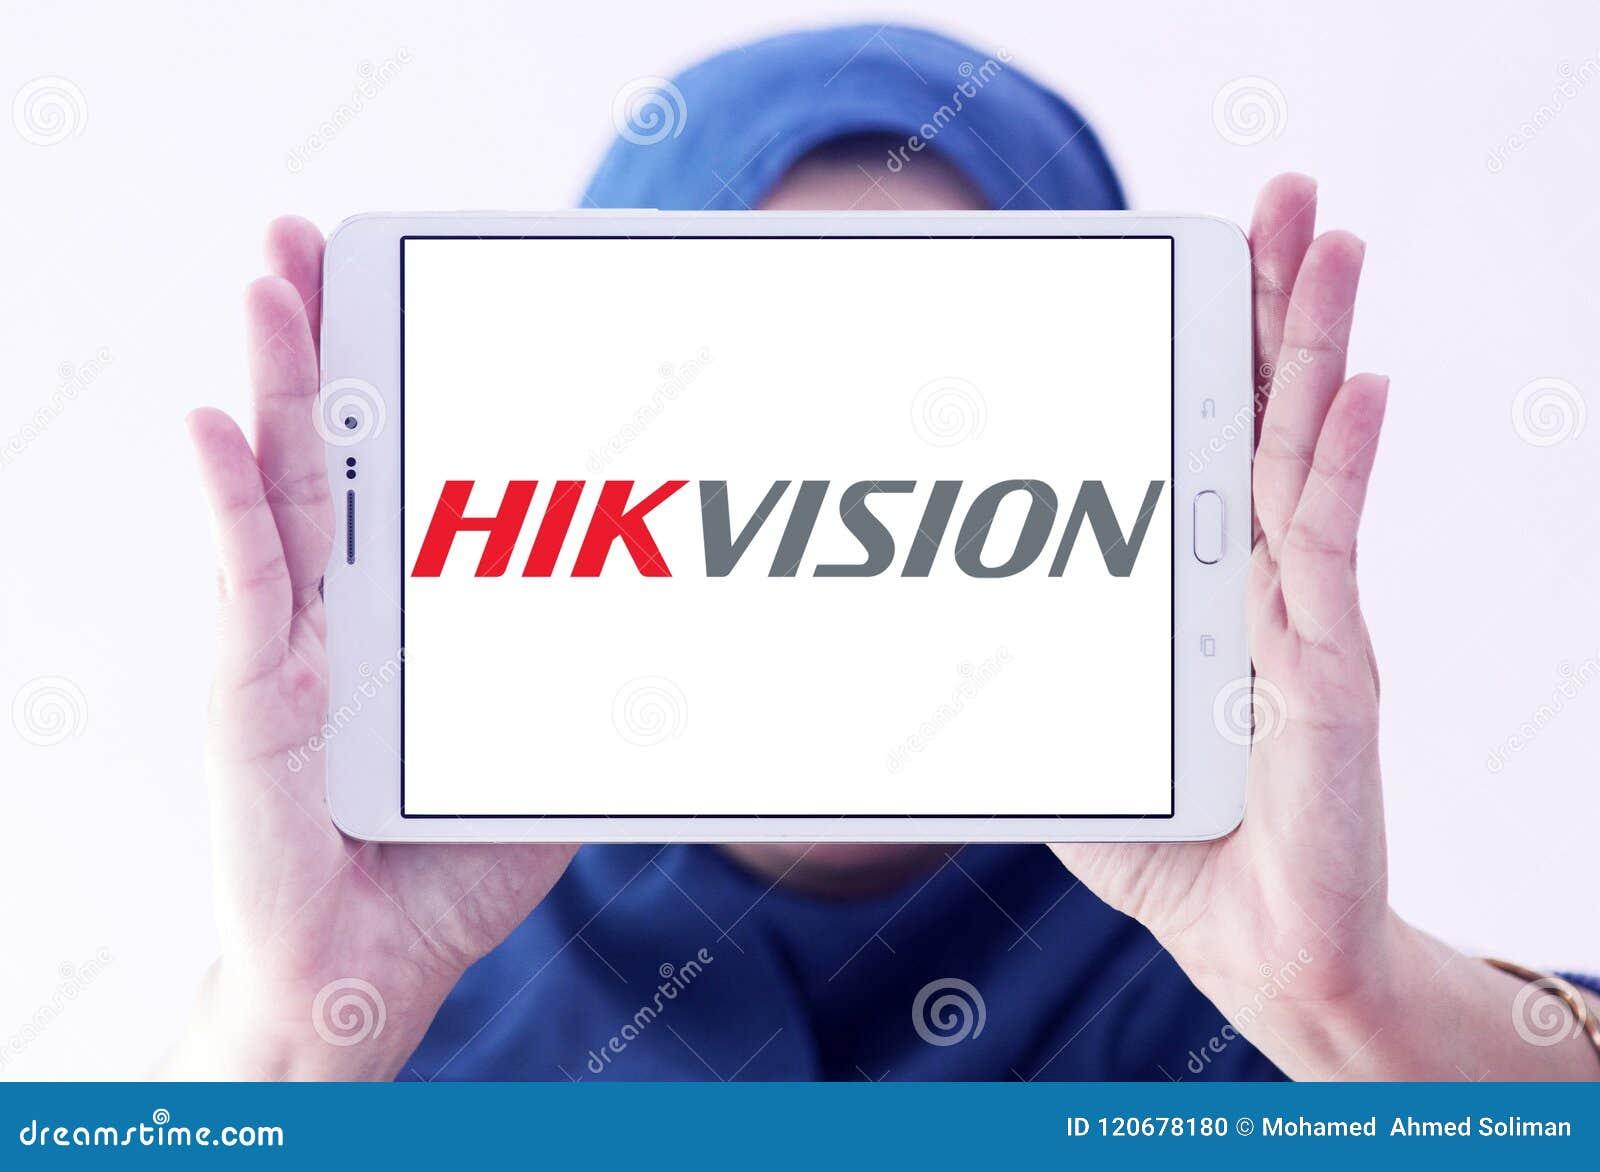 Hikvision Video Surveillance Company Logo Editorial Image - Image of